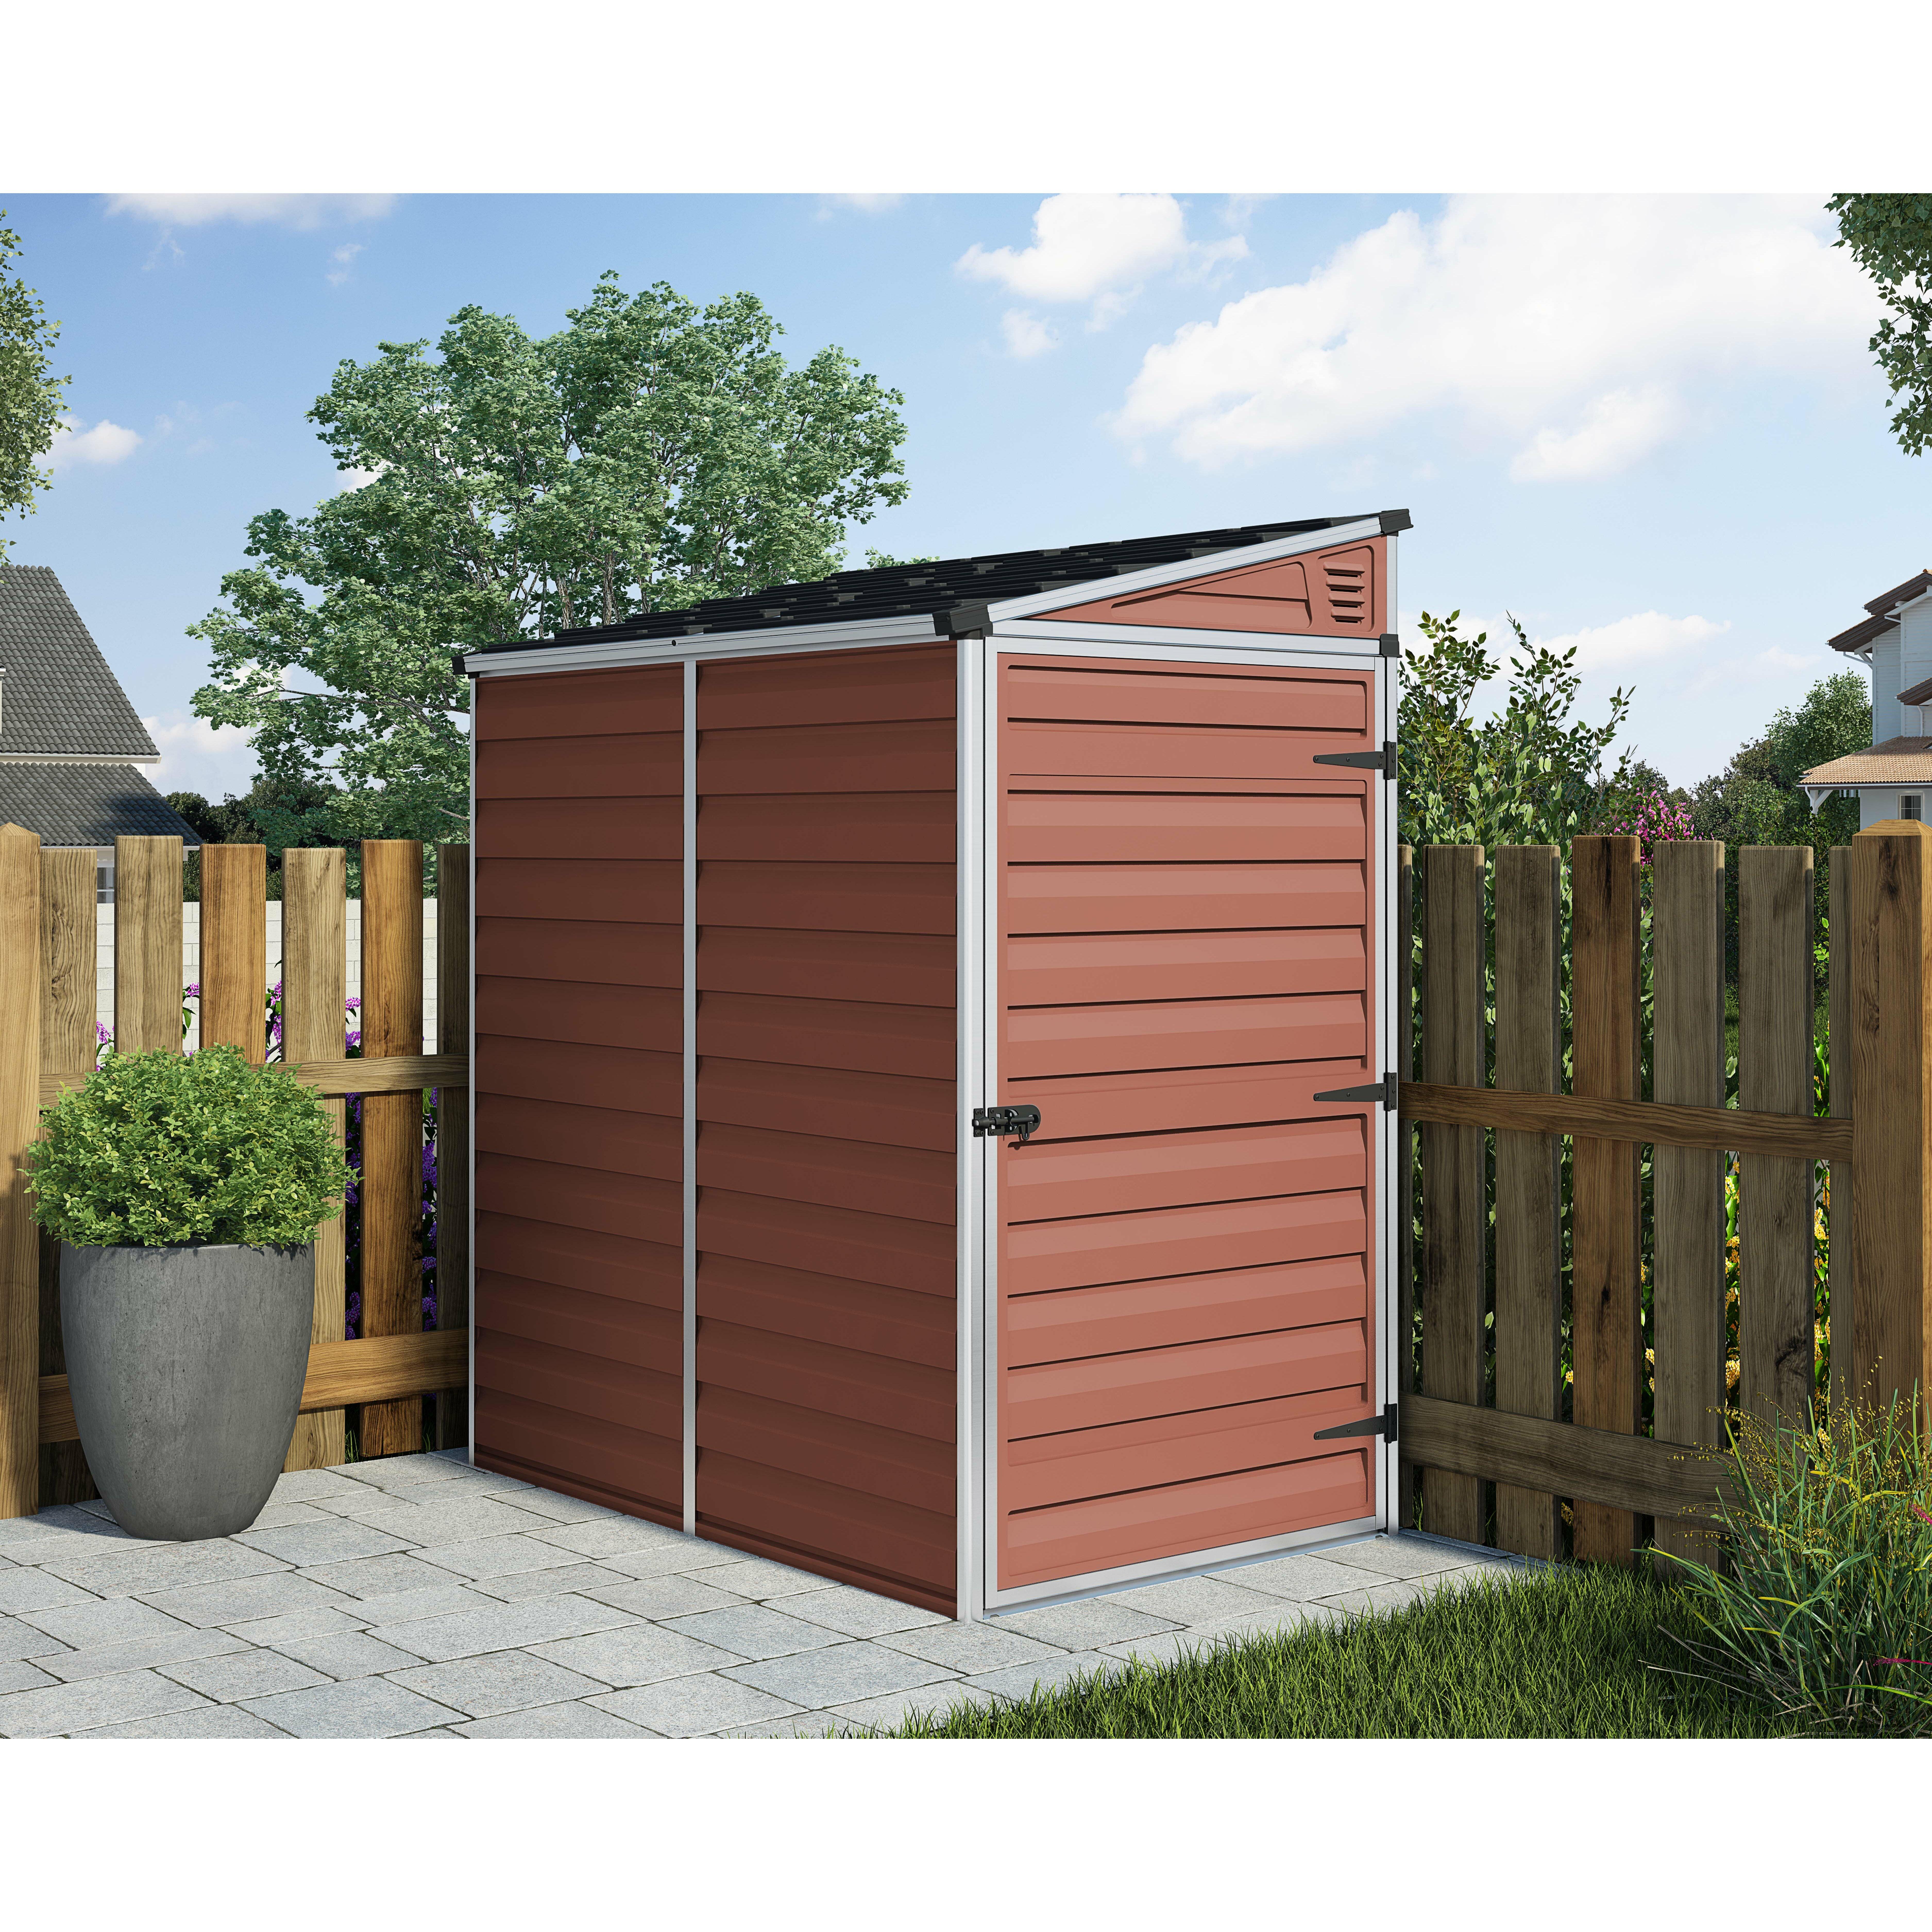 Palram skylight 4 x 6 polycarbonate aluminium storage shed for Garden shed 4 x 2